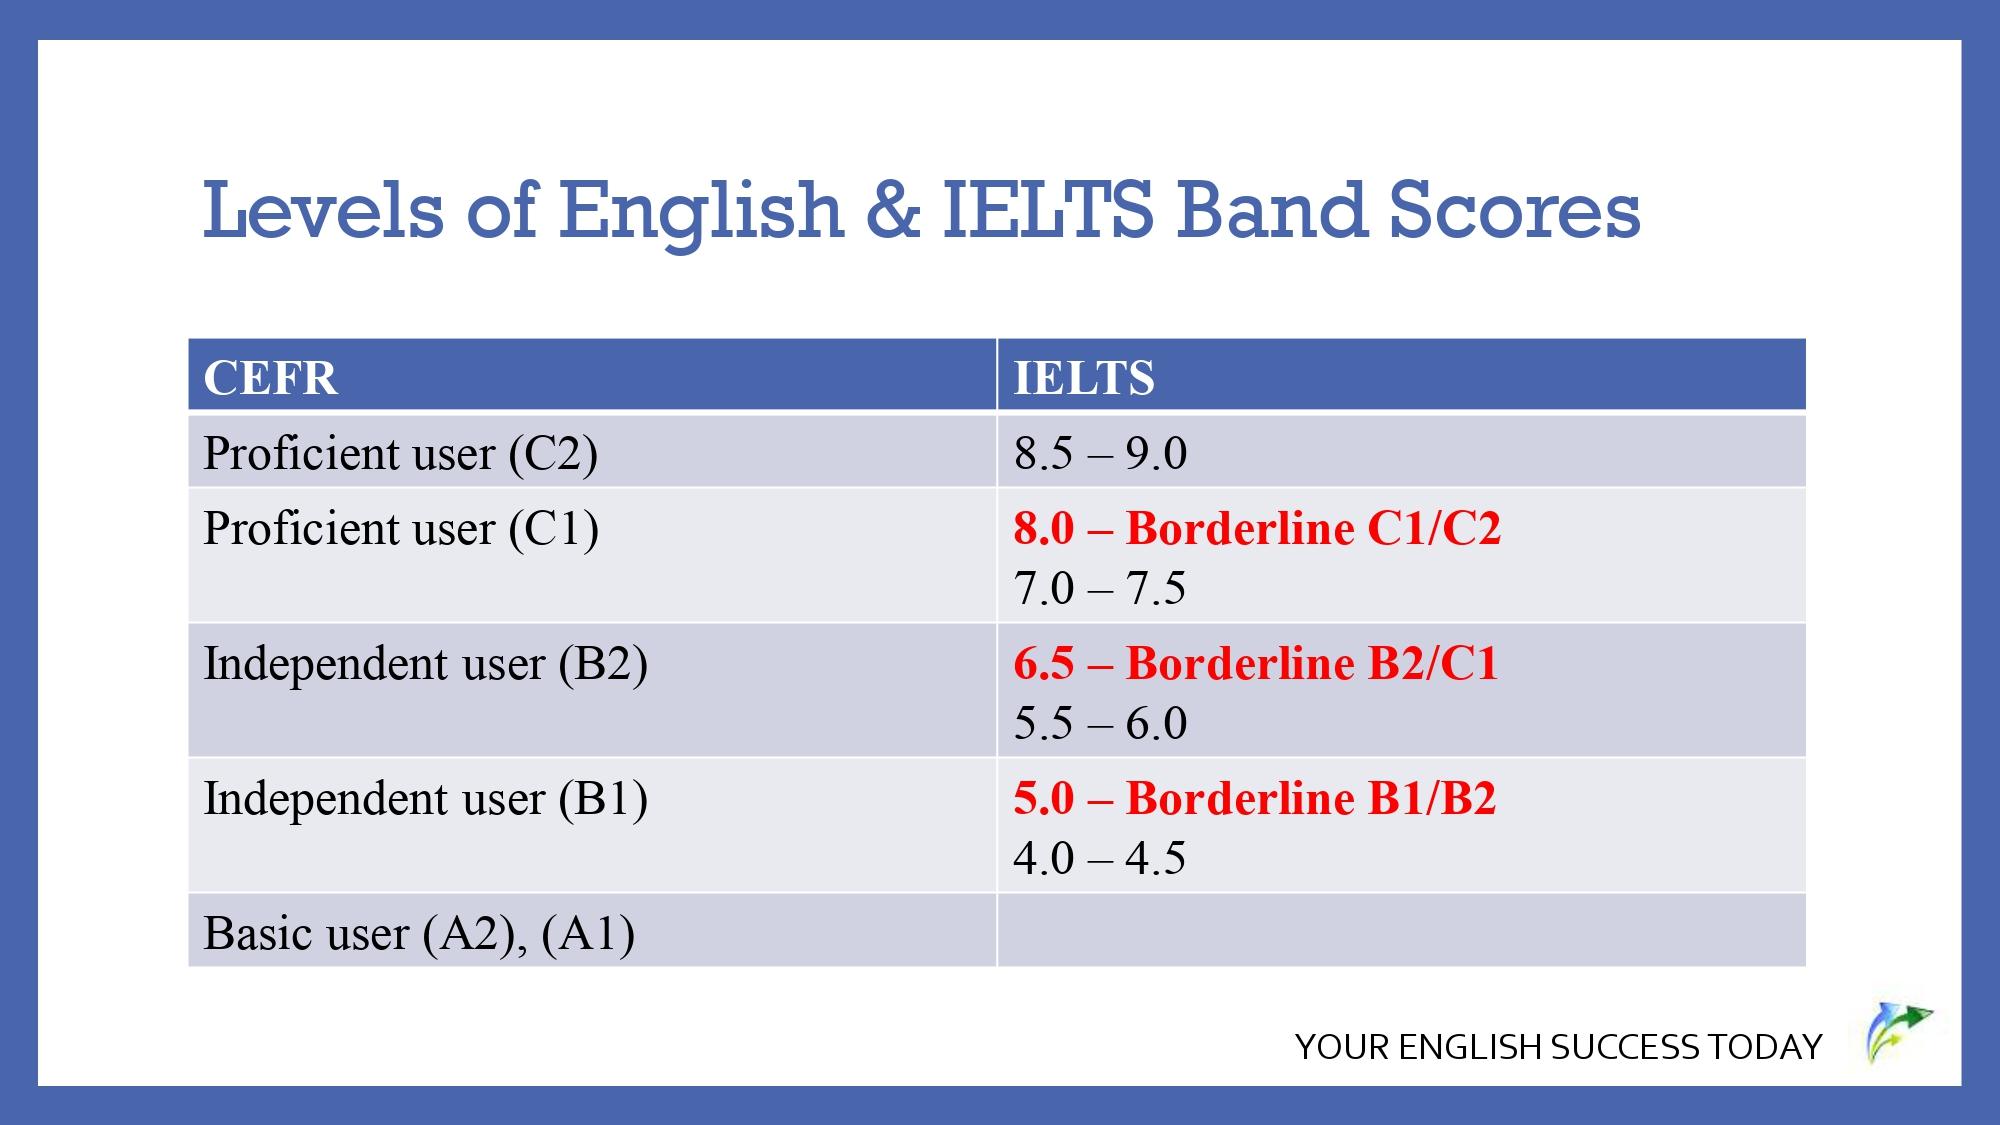 Levels of English & IELTS Band Scores